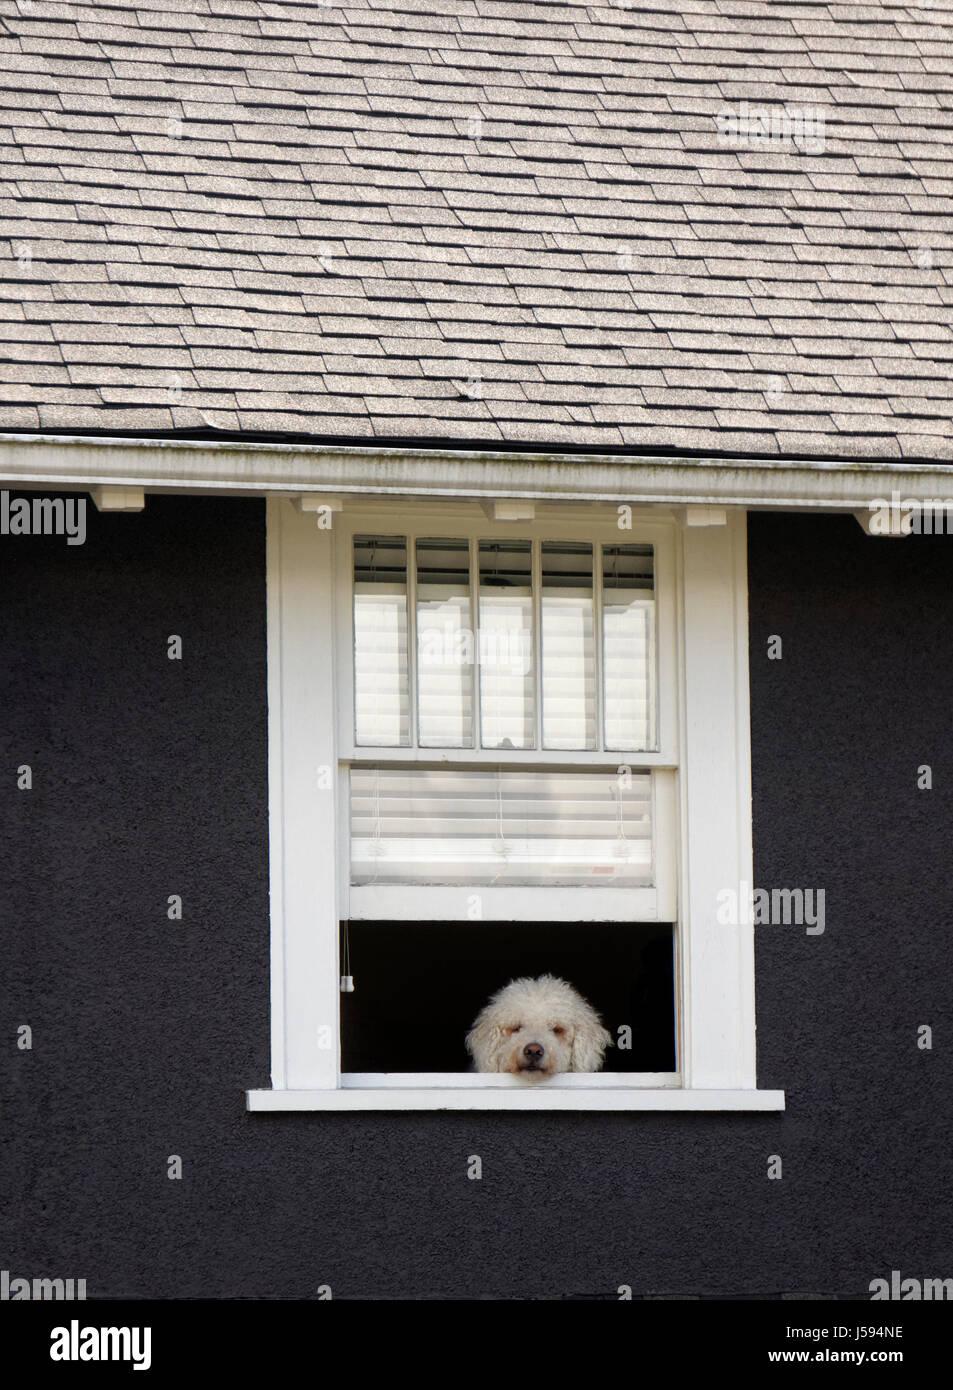 bored-looking-shaggy-white-dog-peering-o